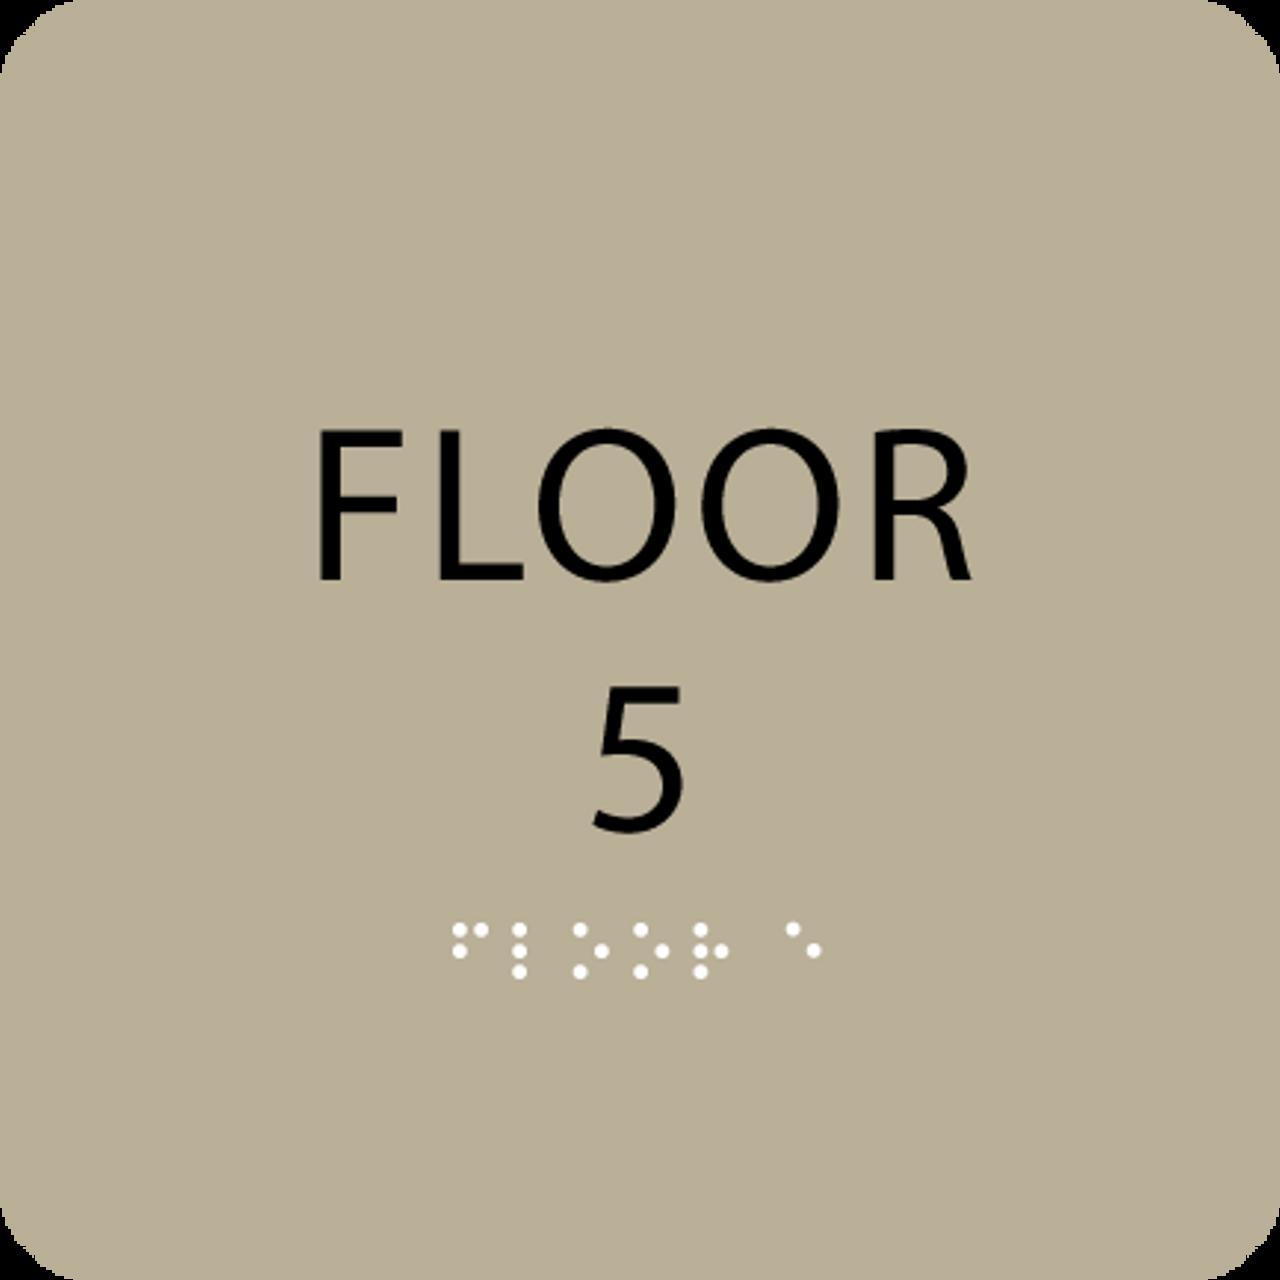 Brown Floor 5 Level Number Sign